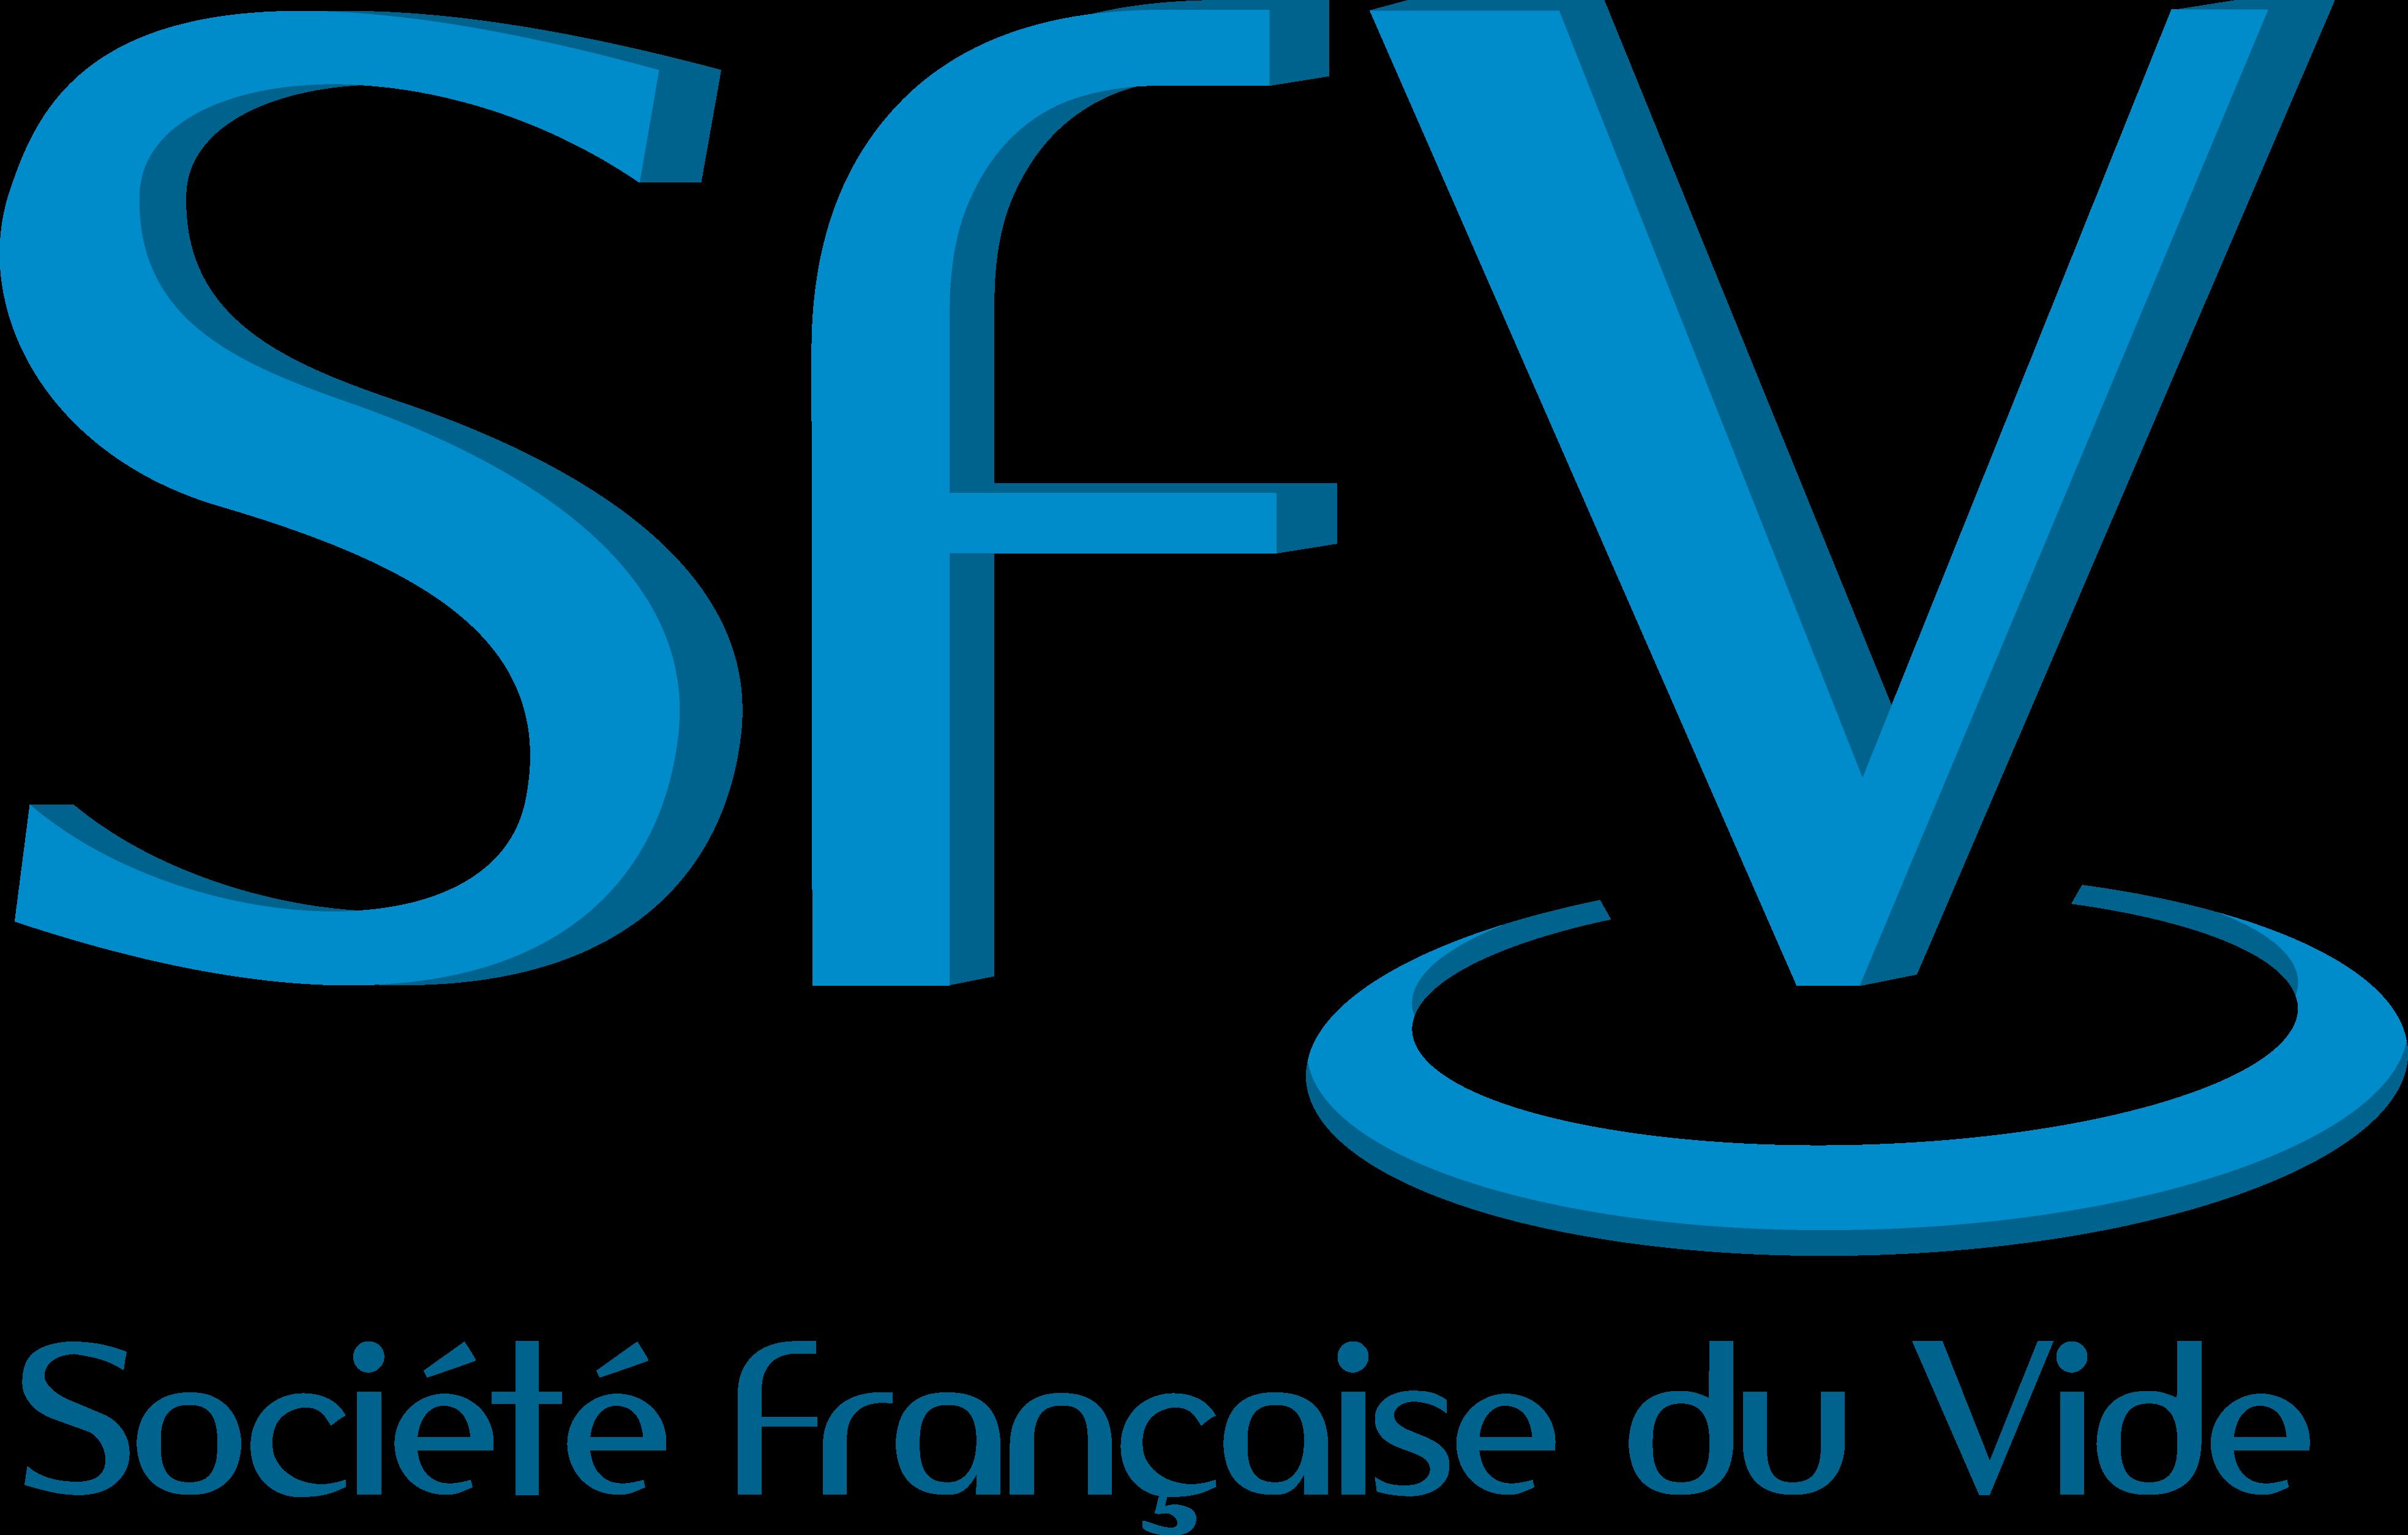 SFV_Logo_SocieteFrancaiseduVide.png